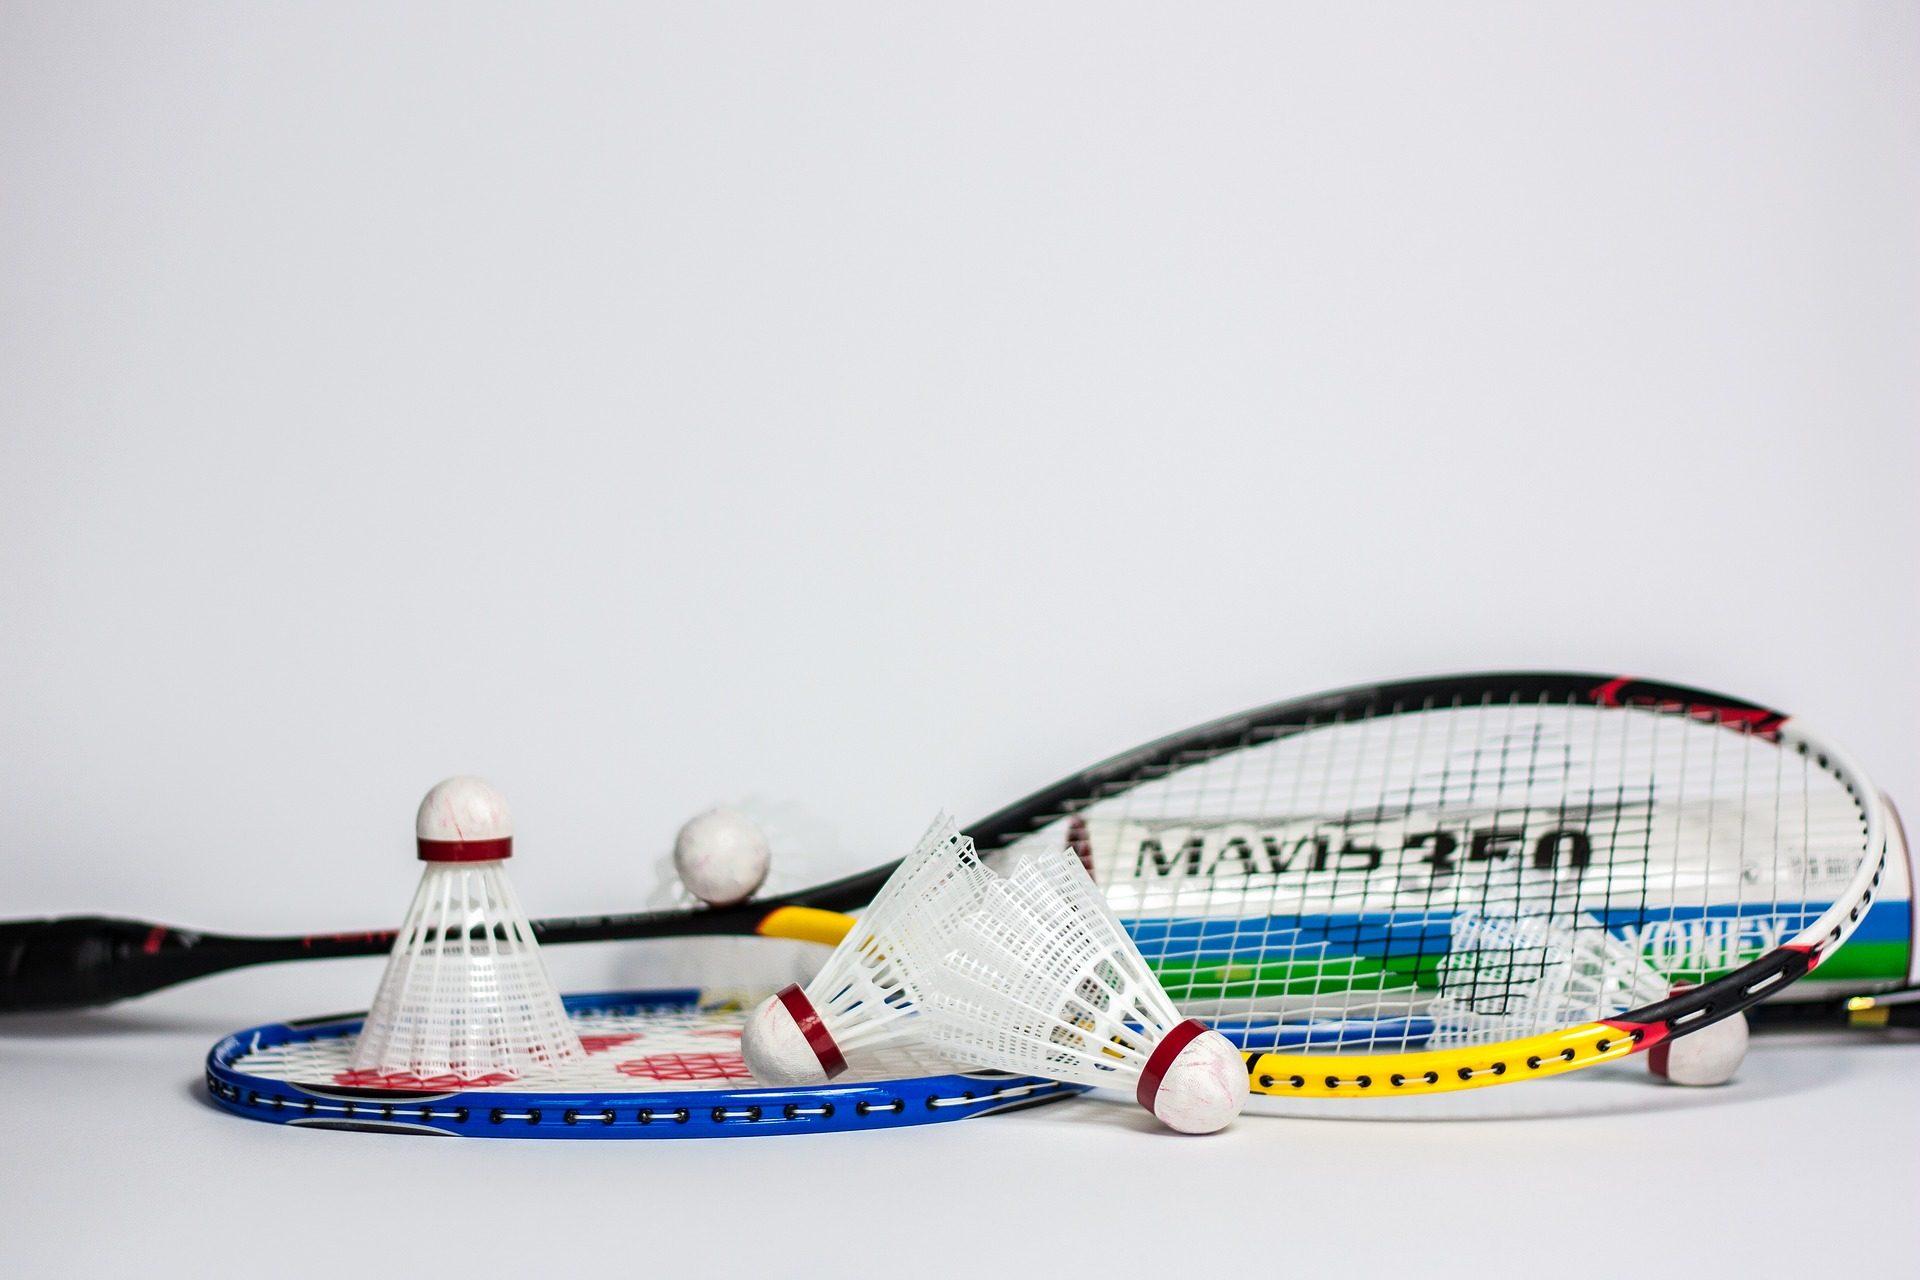 Badminton, Racchette da neve, palle, piume, reti - Sfondi HD - Professor-falken.com